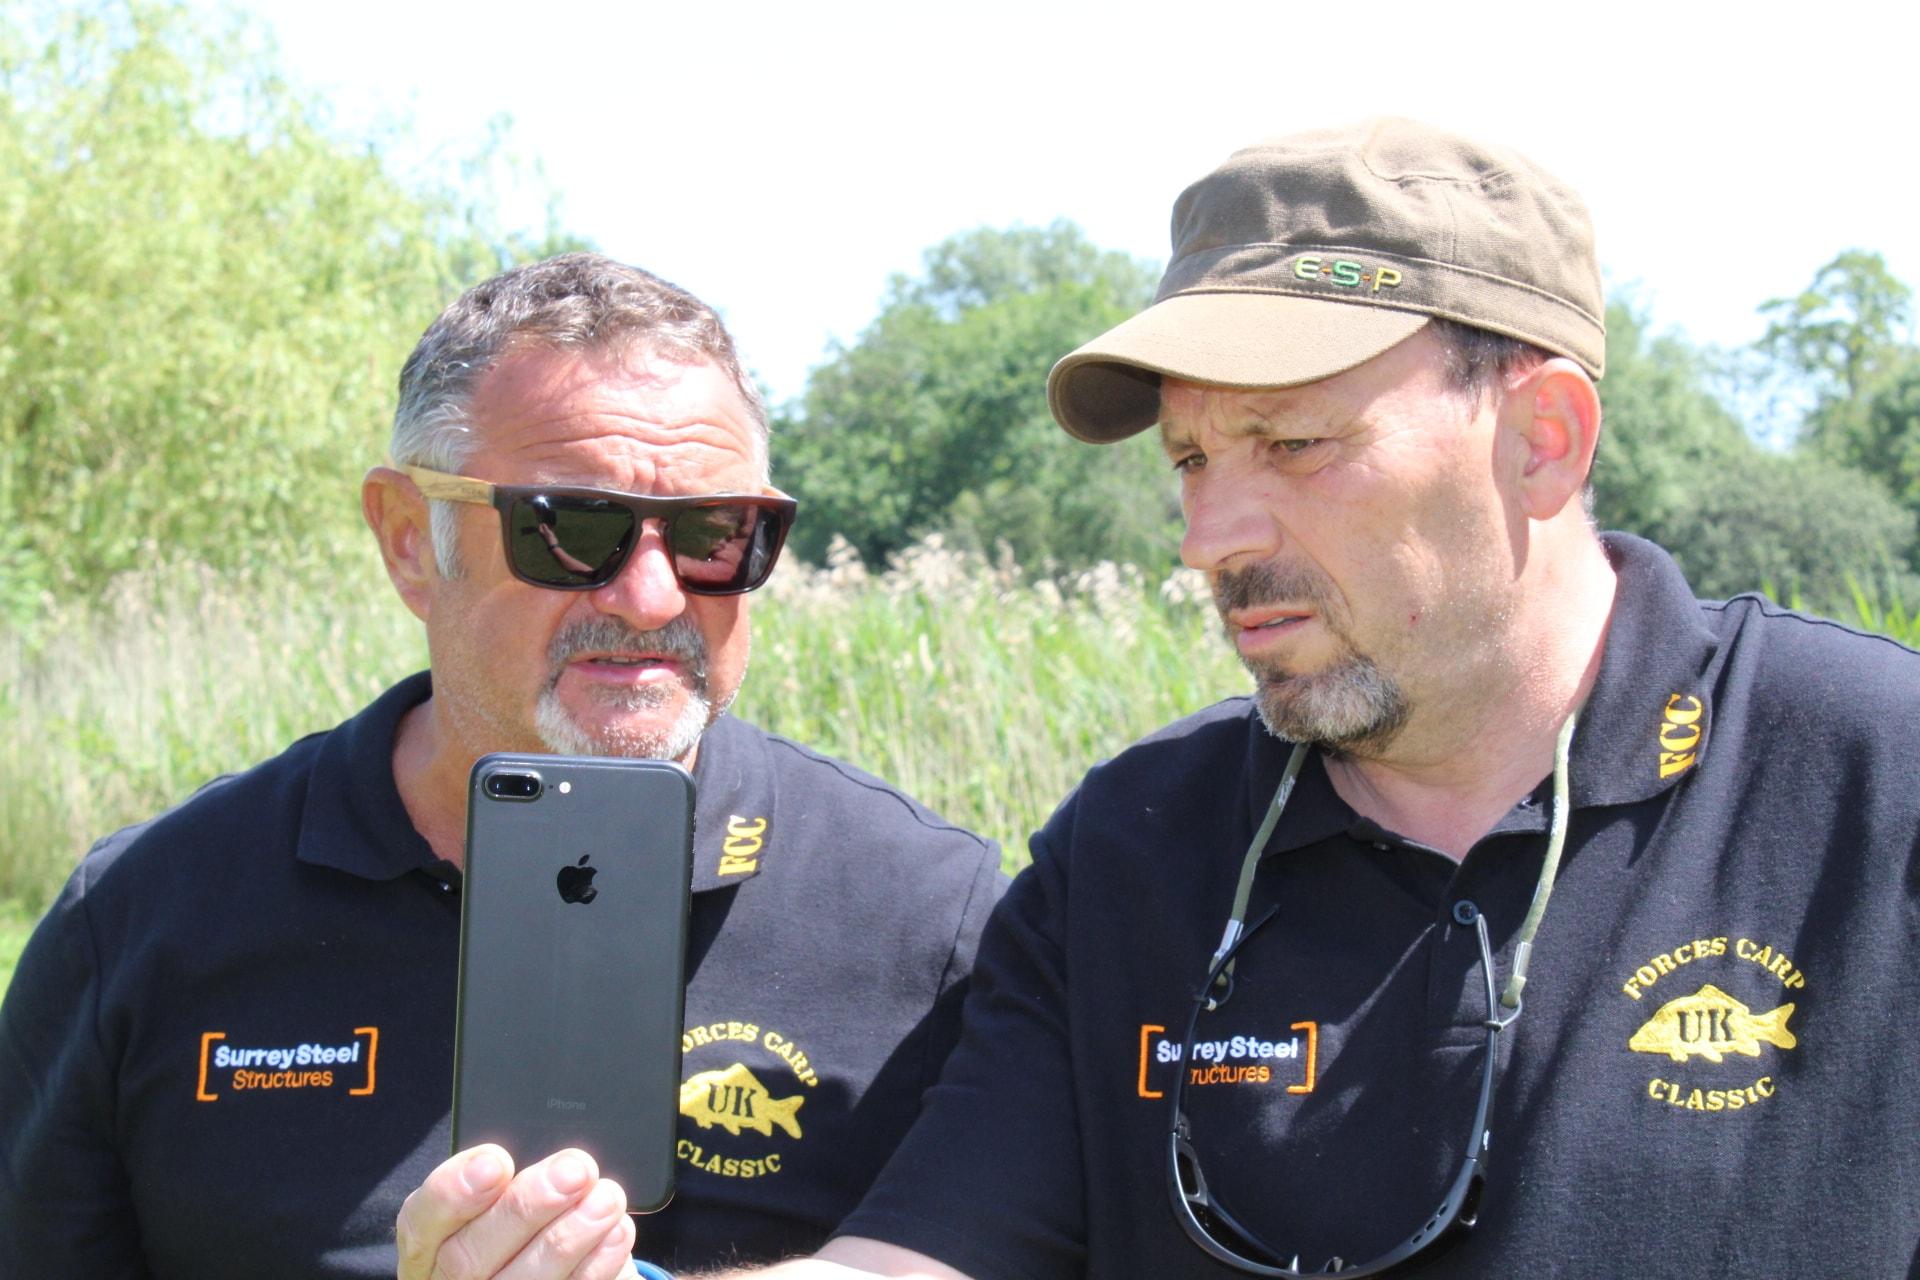 Russ & Tim starting the event